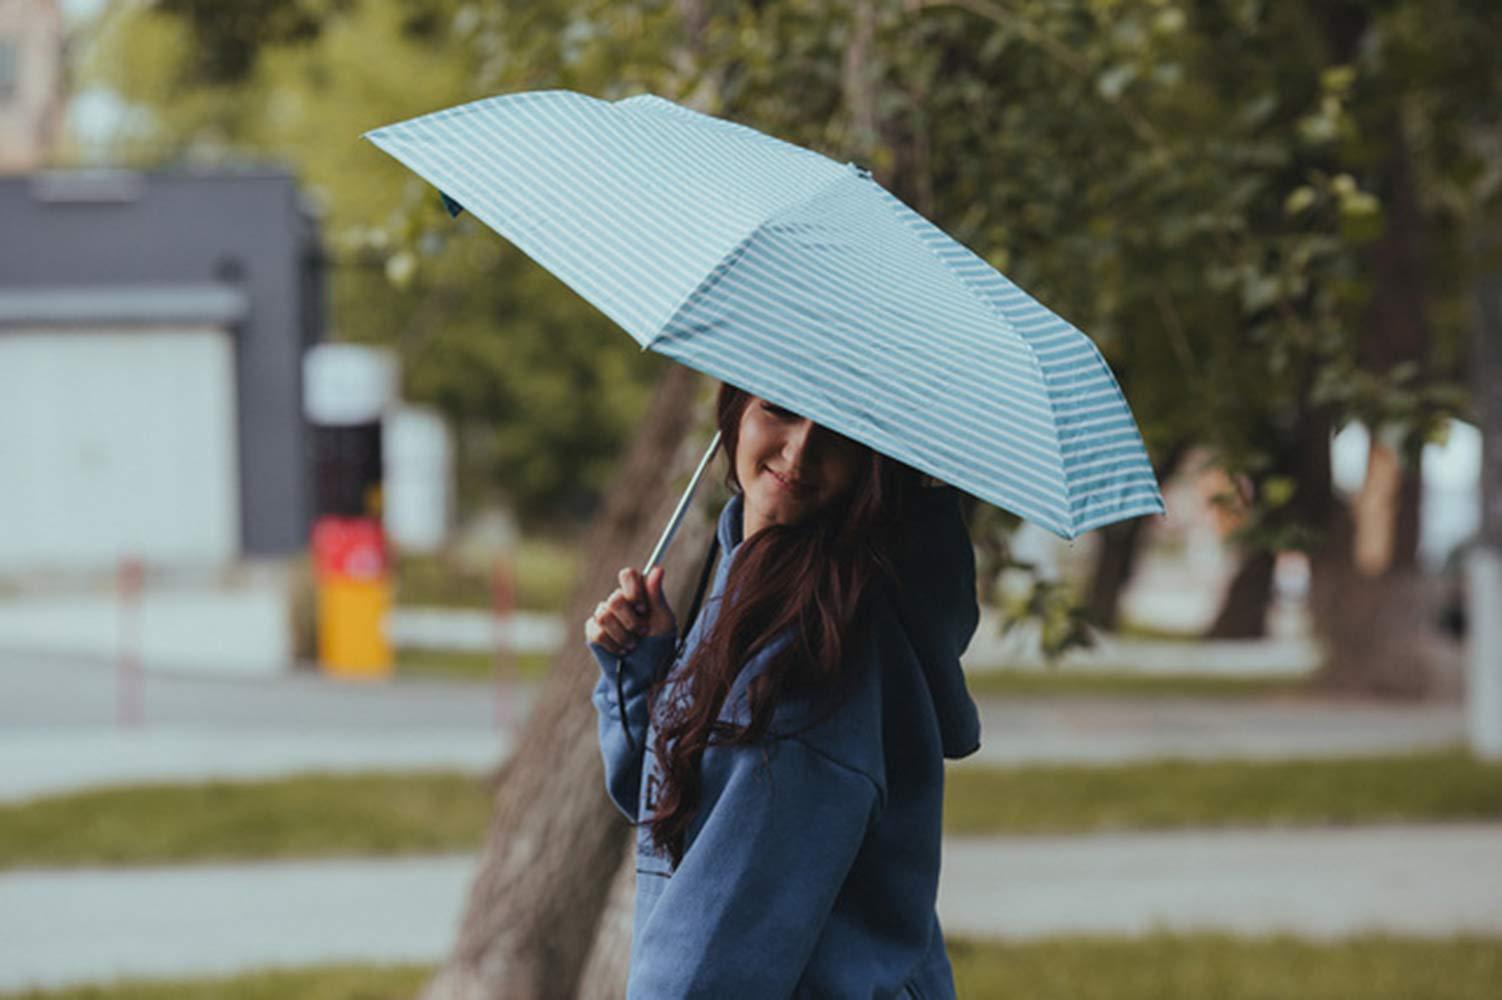 NEW SUSINO Small Mini Sun & Rain UV Protection Umbrella Lightweight Compact Travel for Women Kids Purse Backpack Mint Green/White by NEW SUSINO (Image #4)